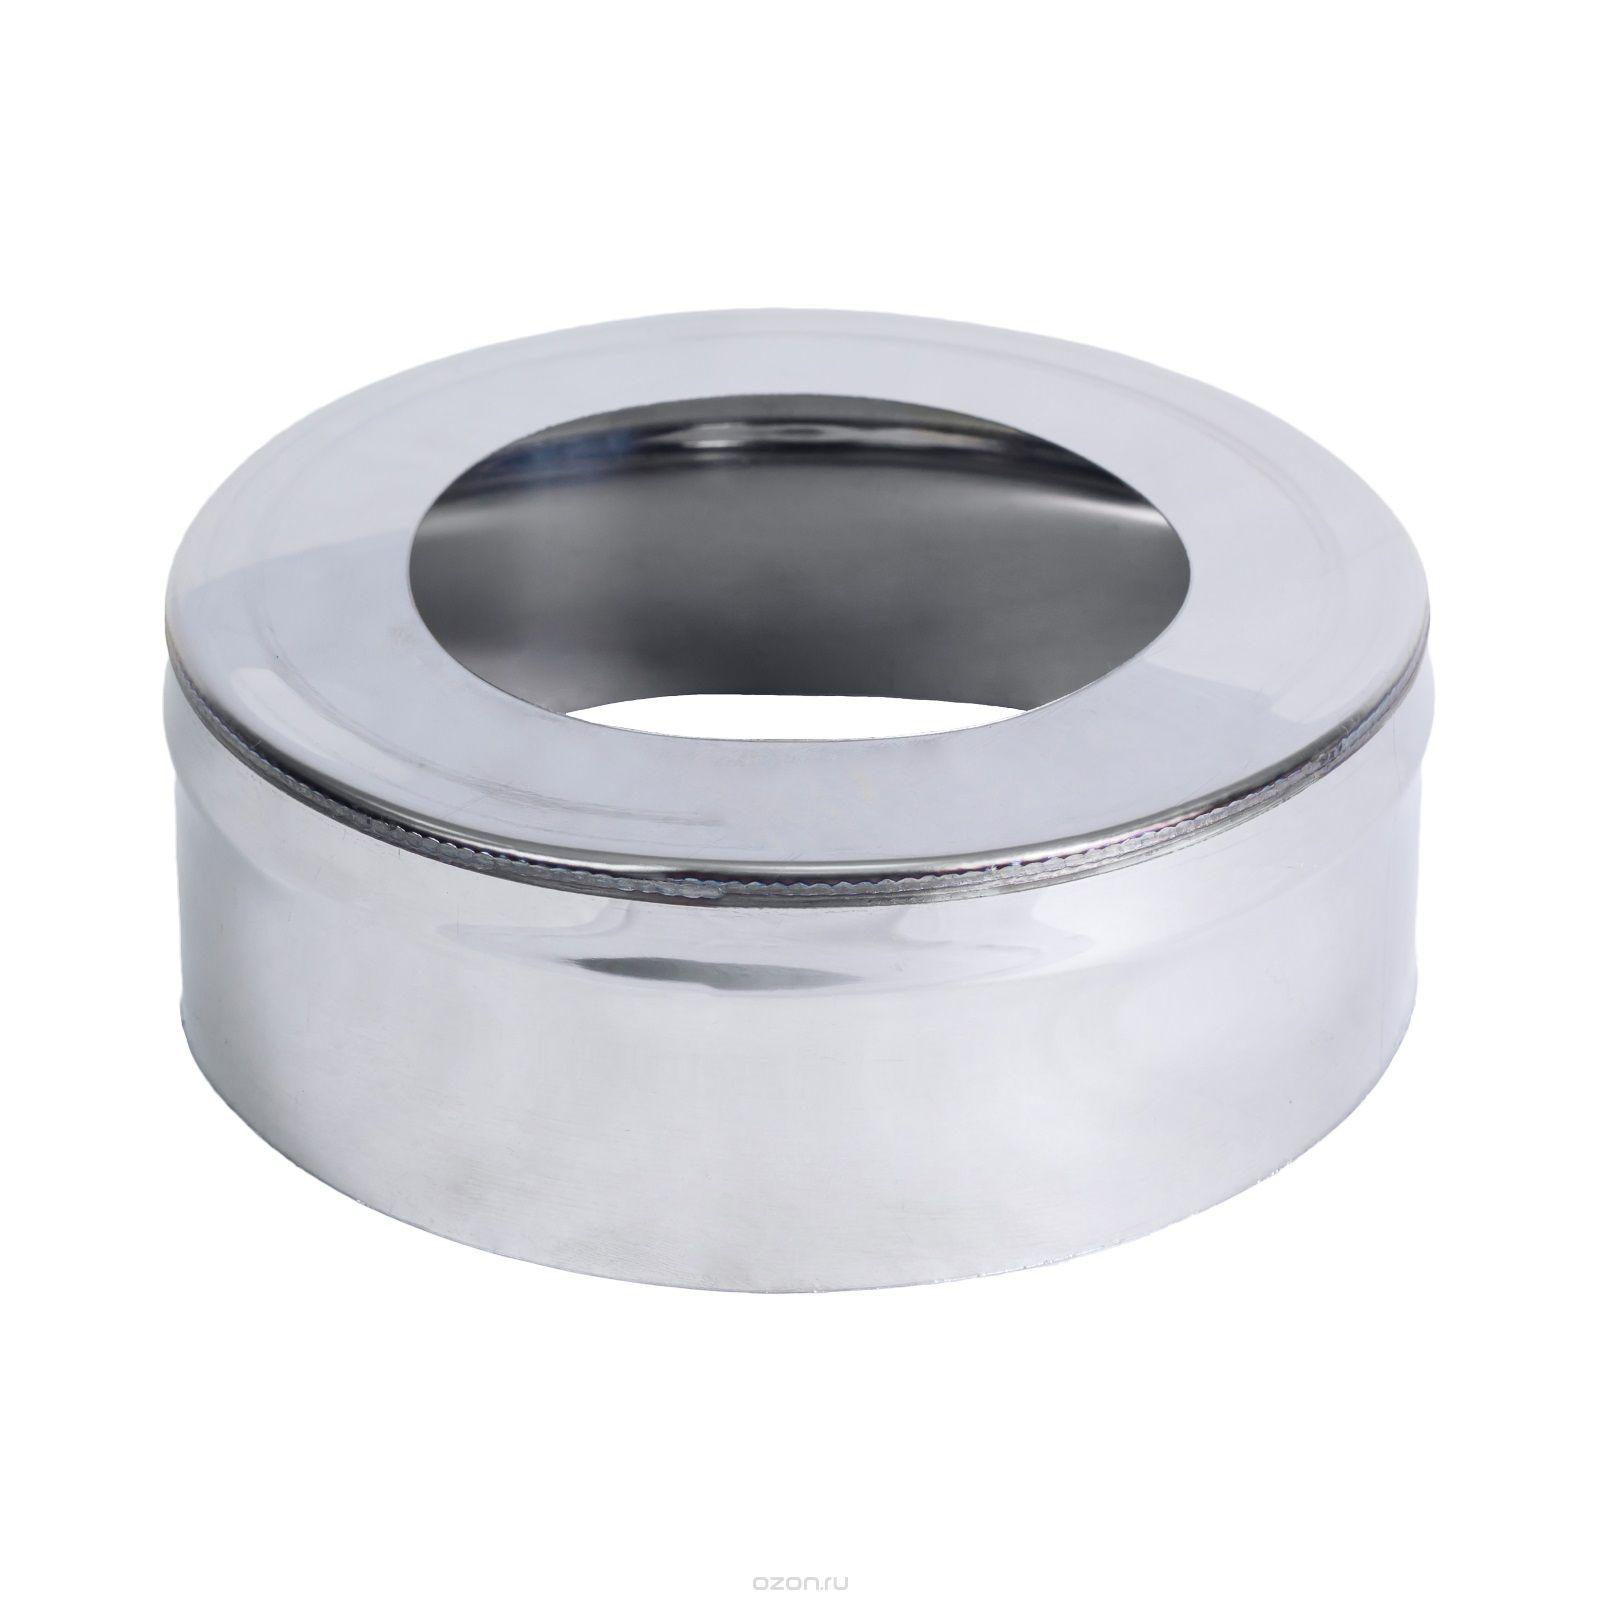 Заглушка ф 200 х120 мм н/ж 0,5мм с отверстием